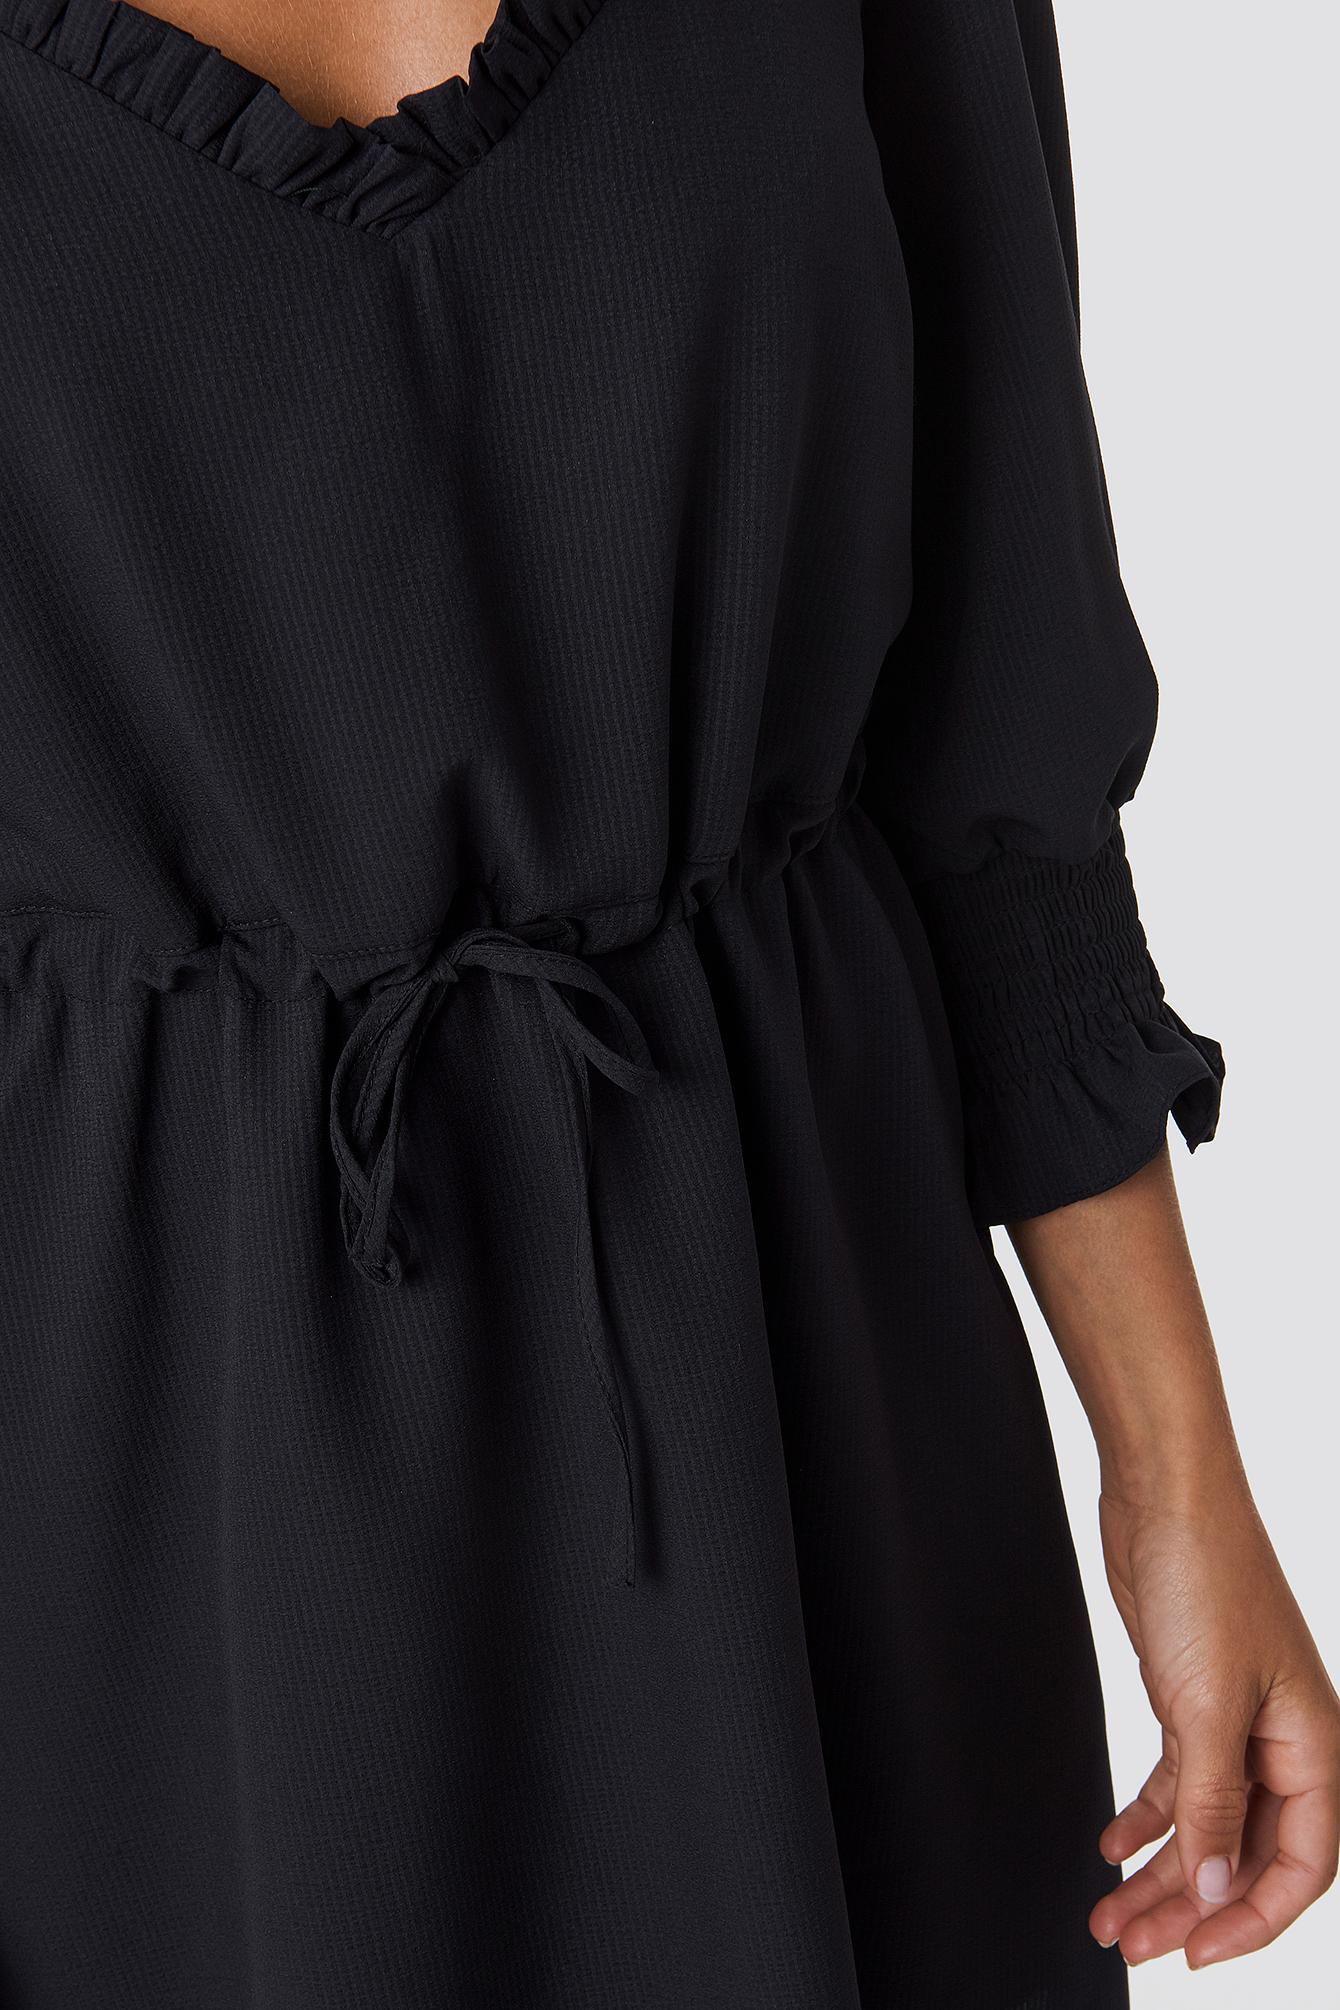 Milla U Dress NA-KD.COM